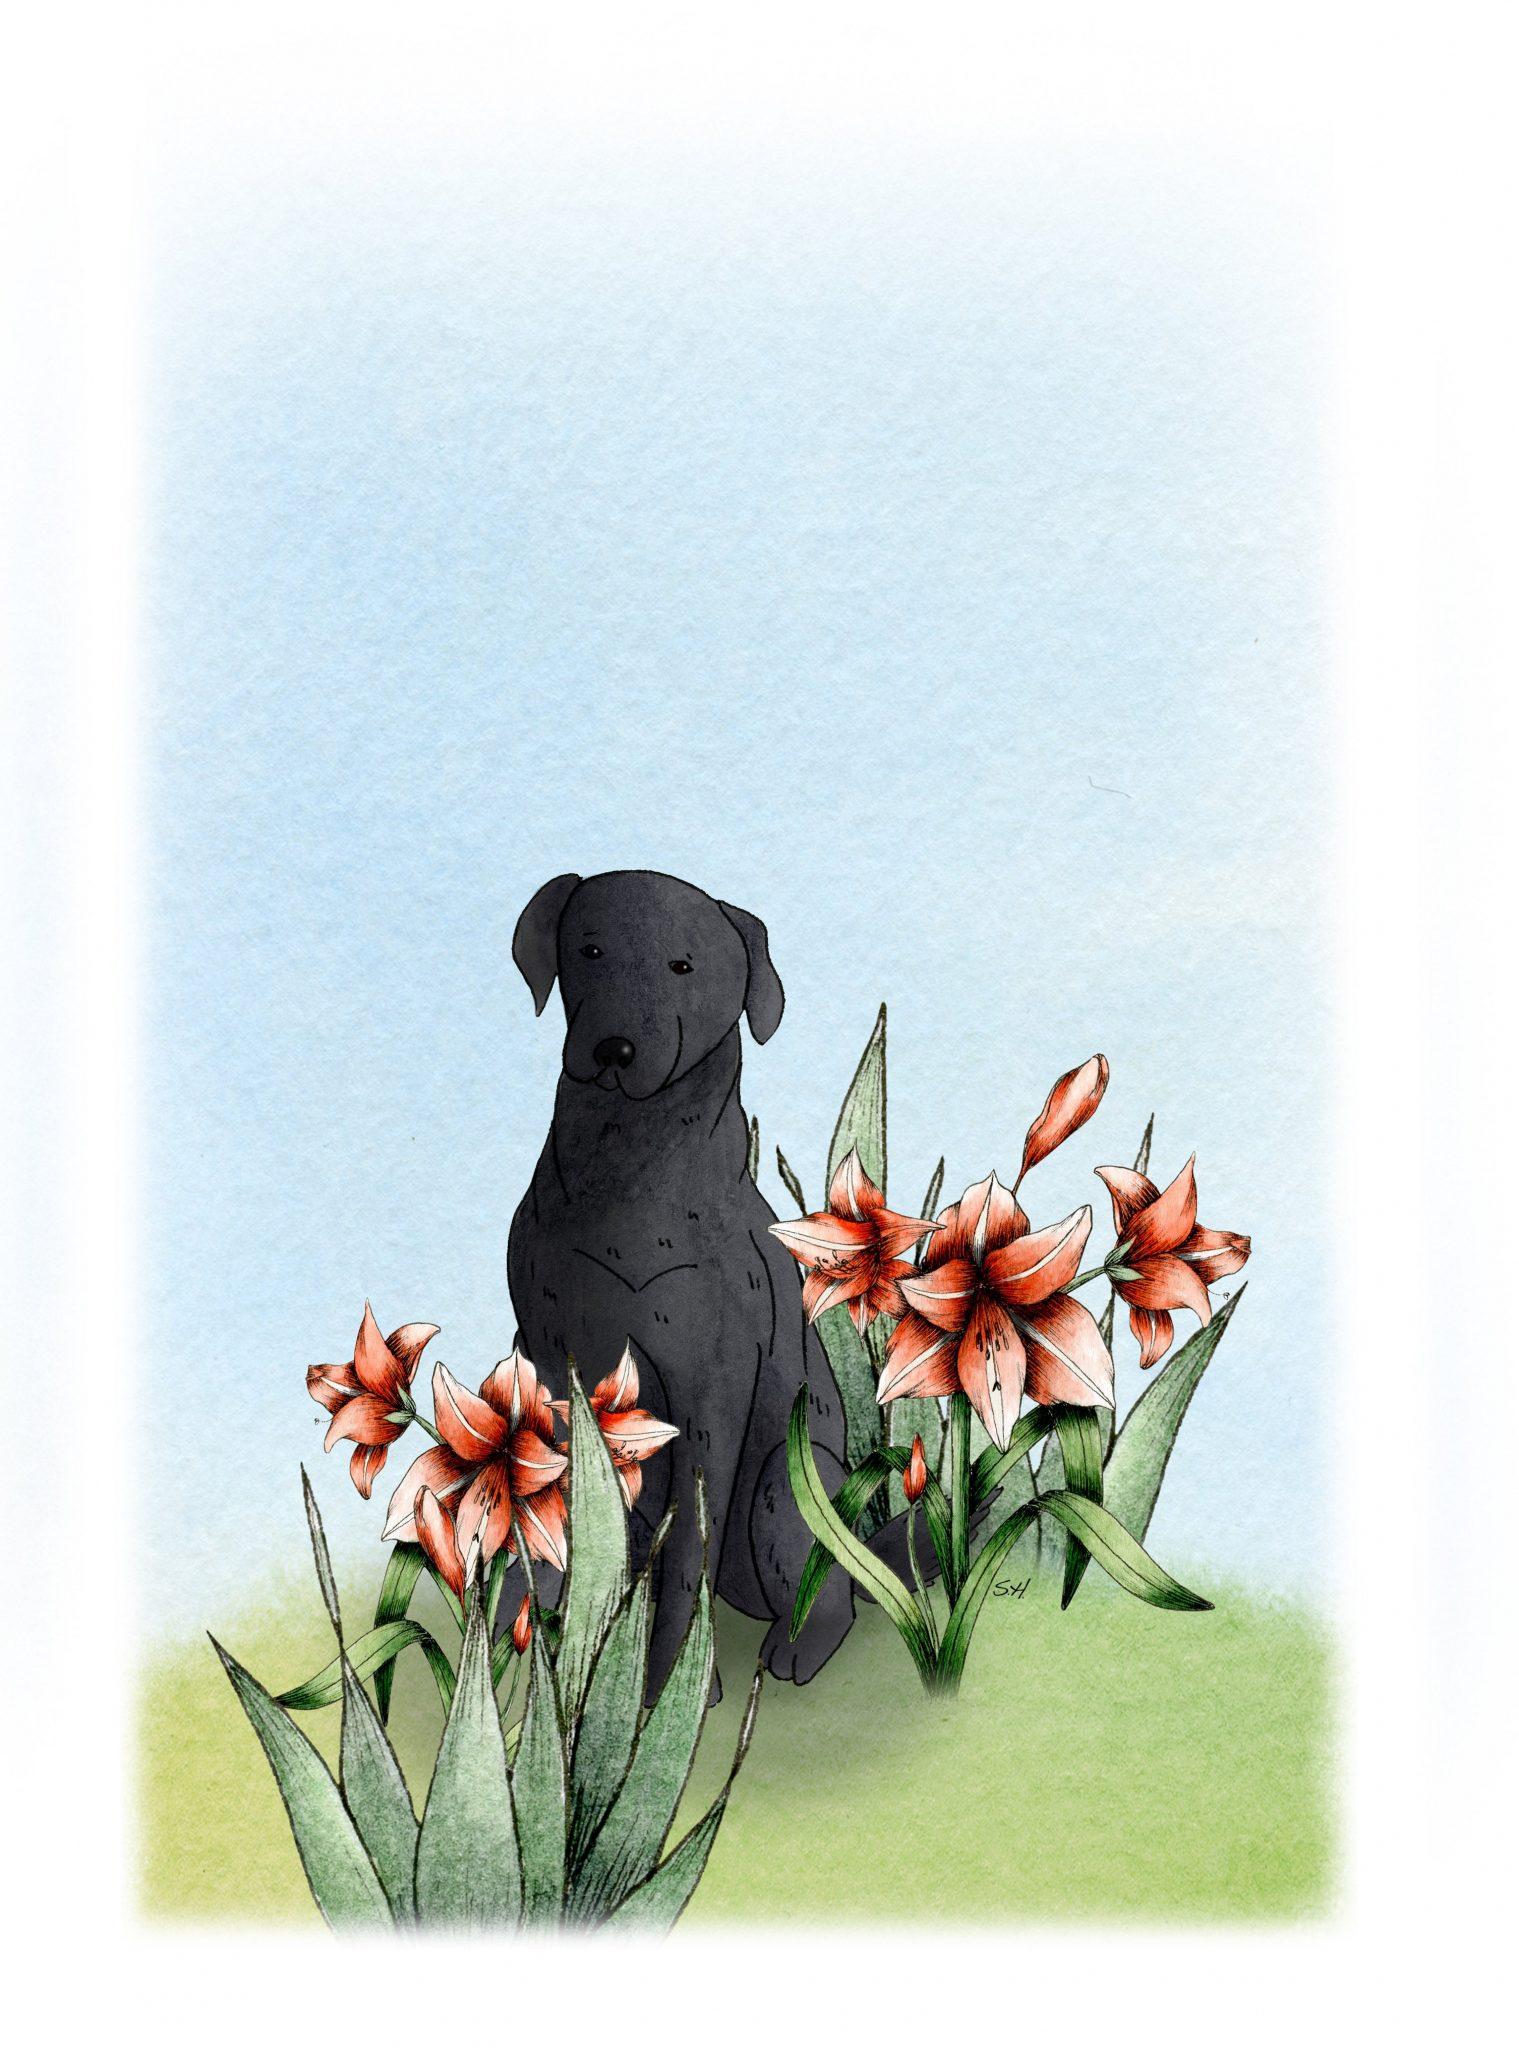 Ozzy dog